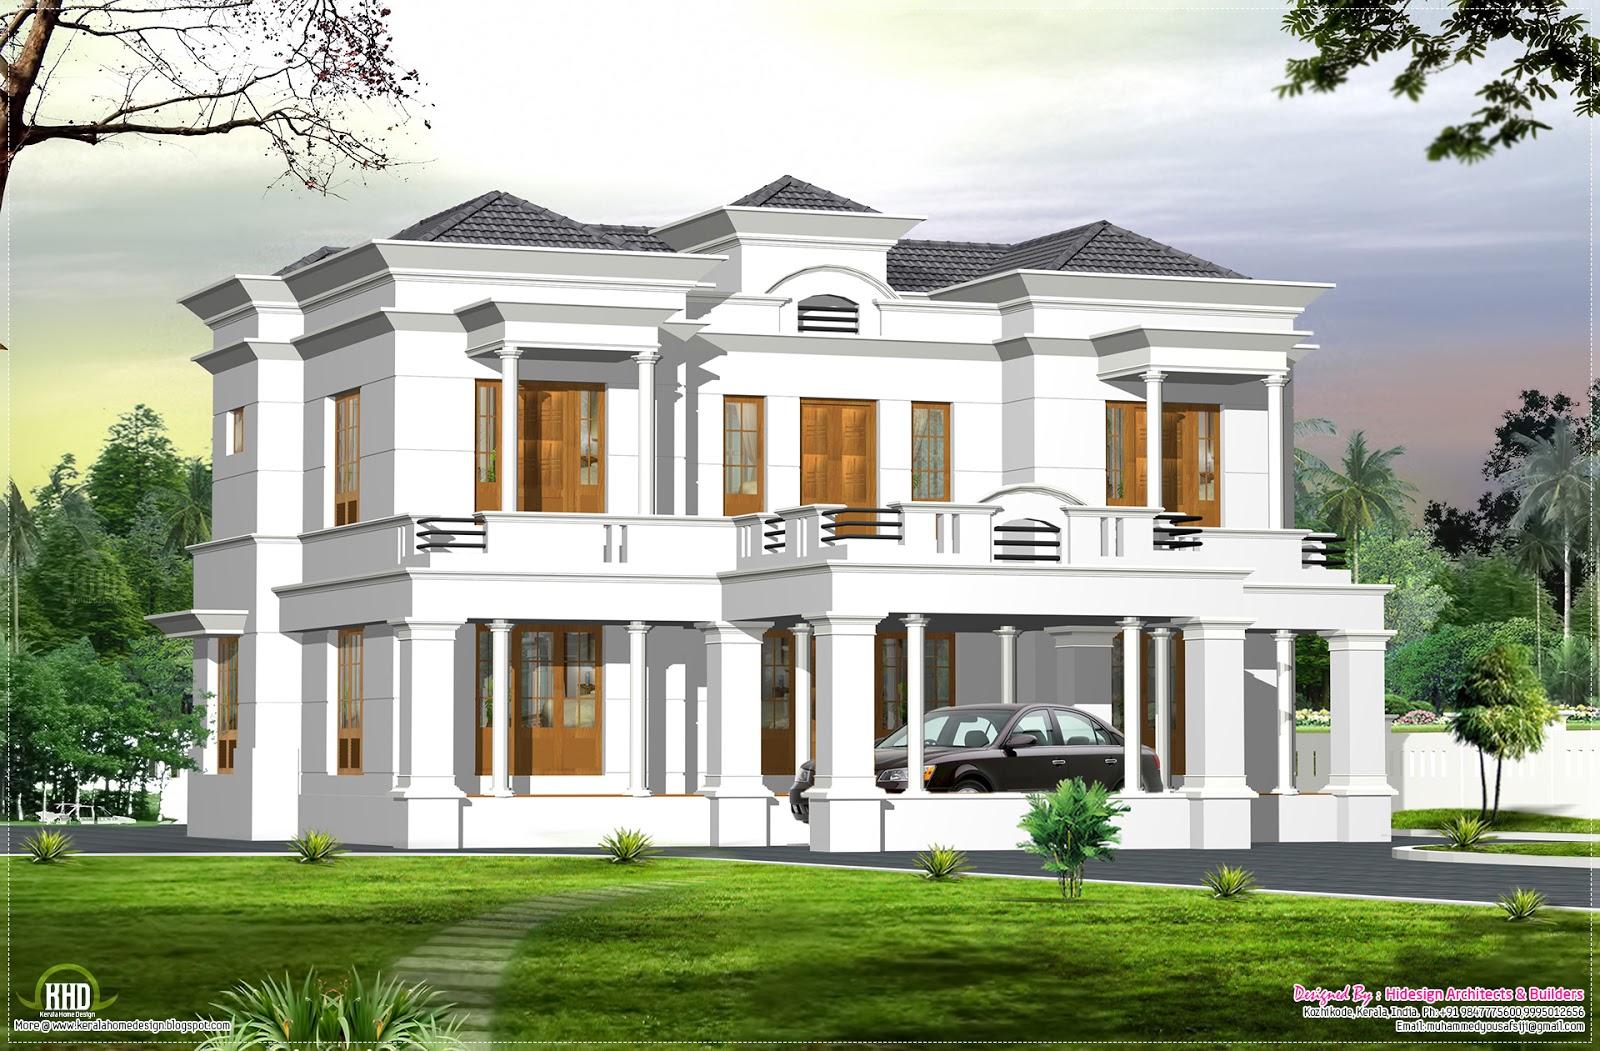 2750 Sq Feet 4 Bedroom Home Elevation Home Kerala Plans